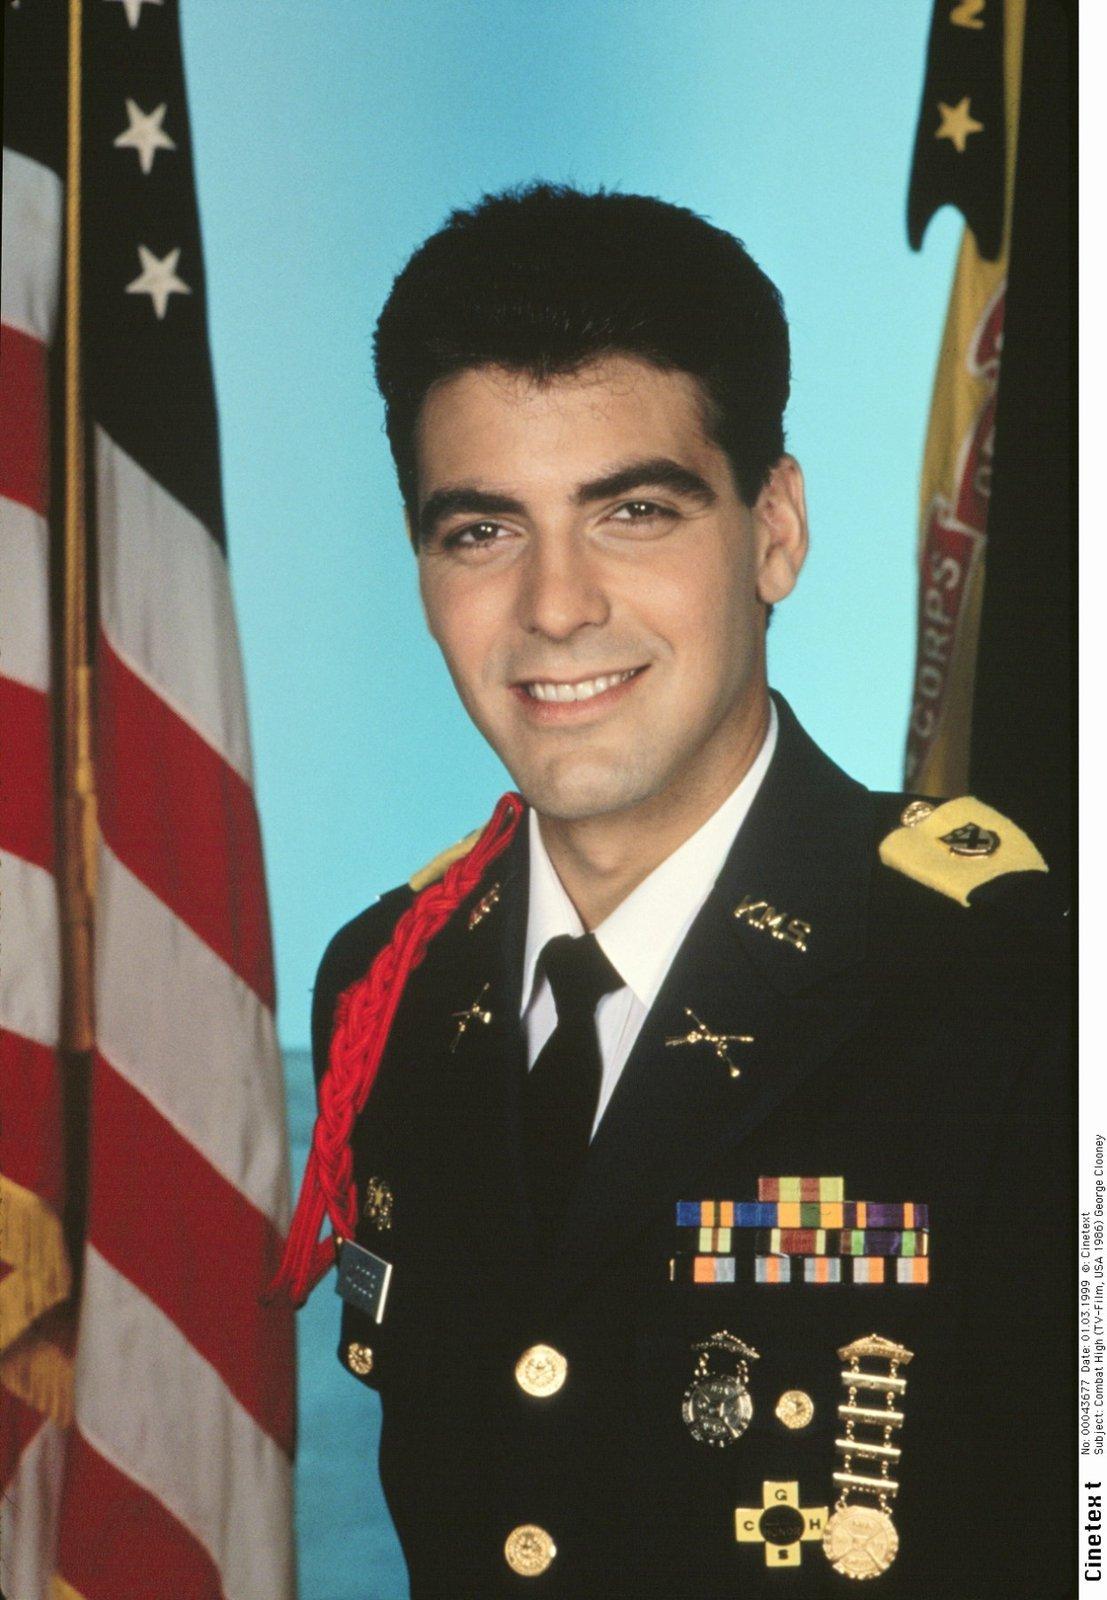 George Clooney jako voják ve filmu Combat High z roku 1986.